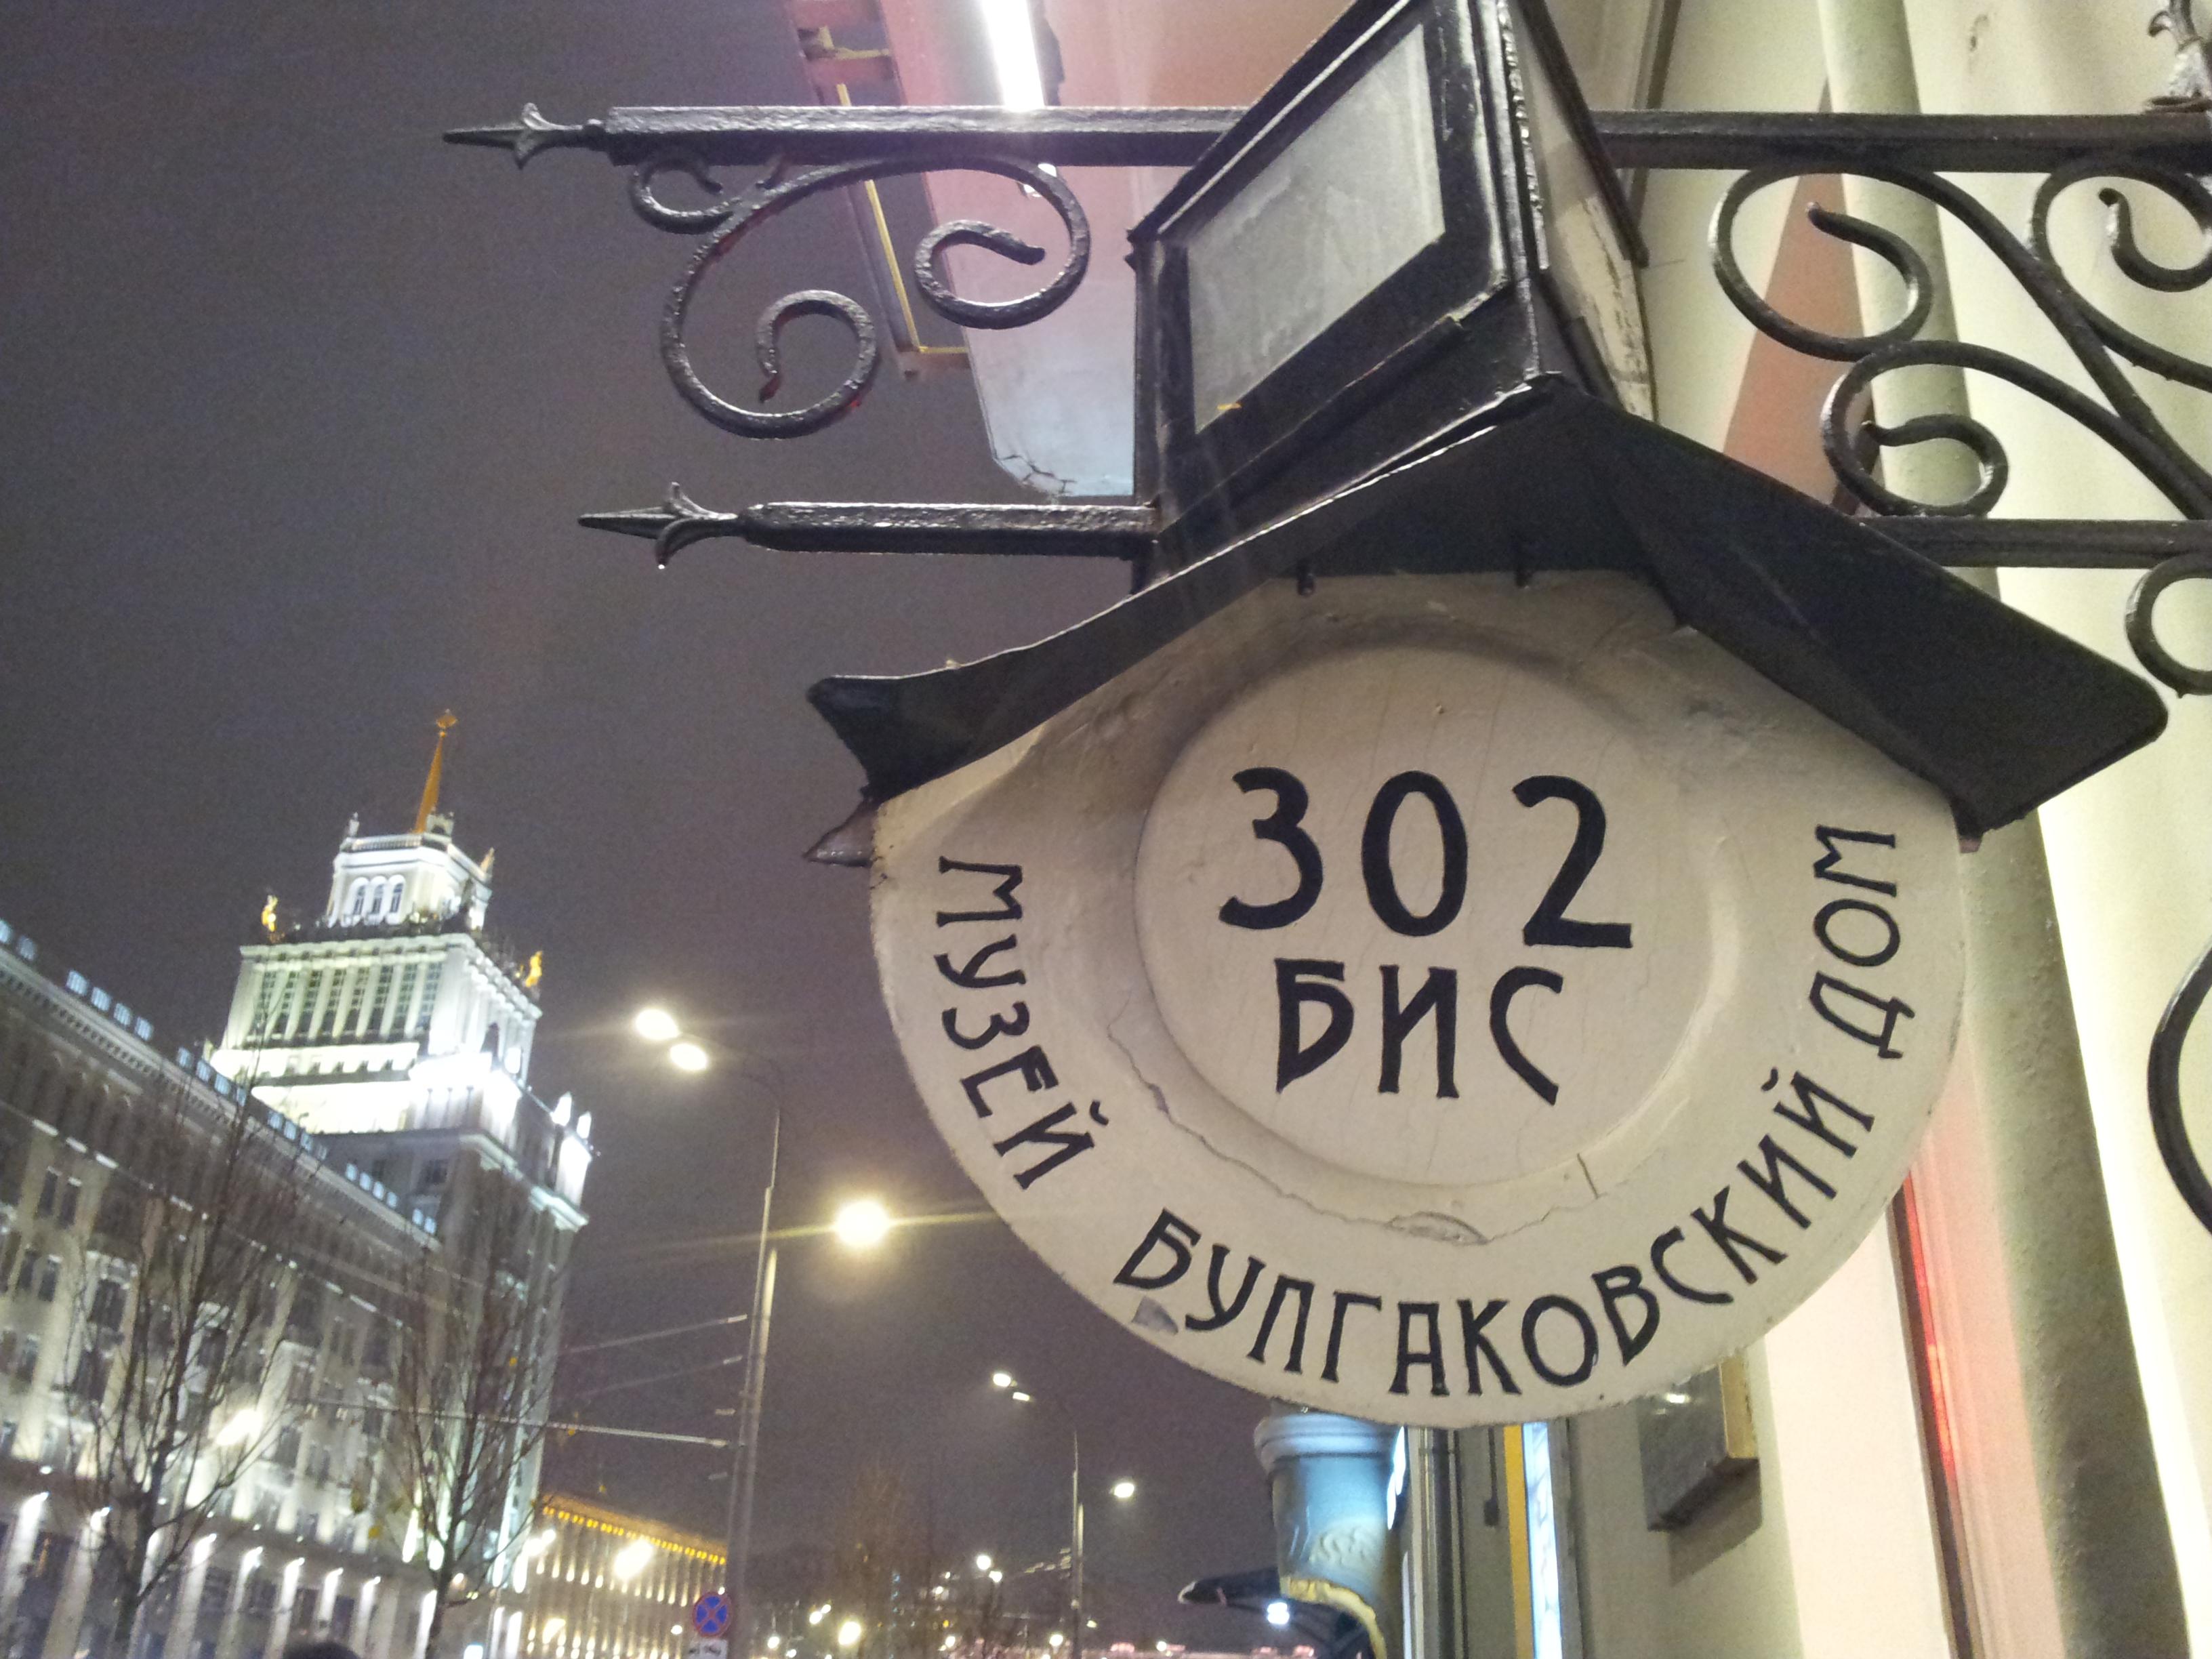 МУзей БУлгаковский дом 302 БИС